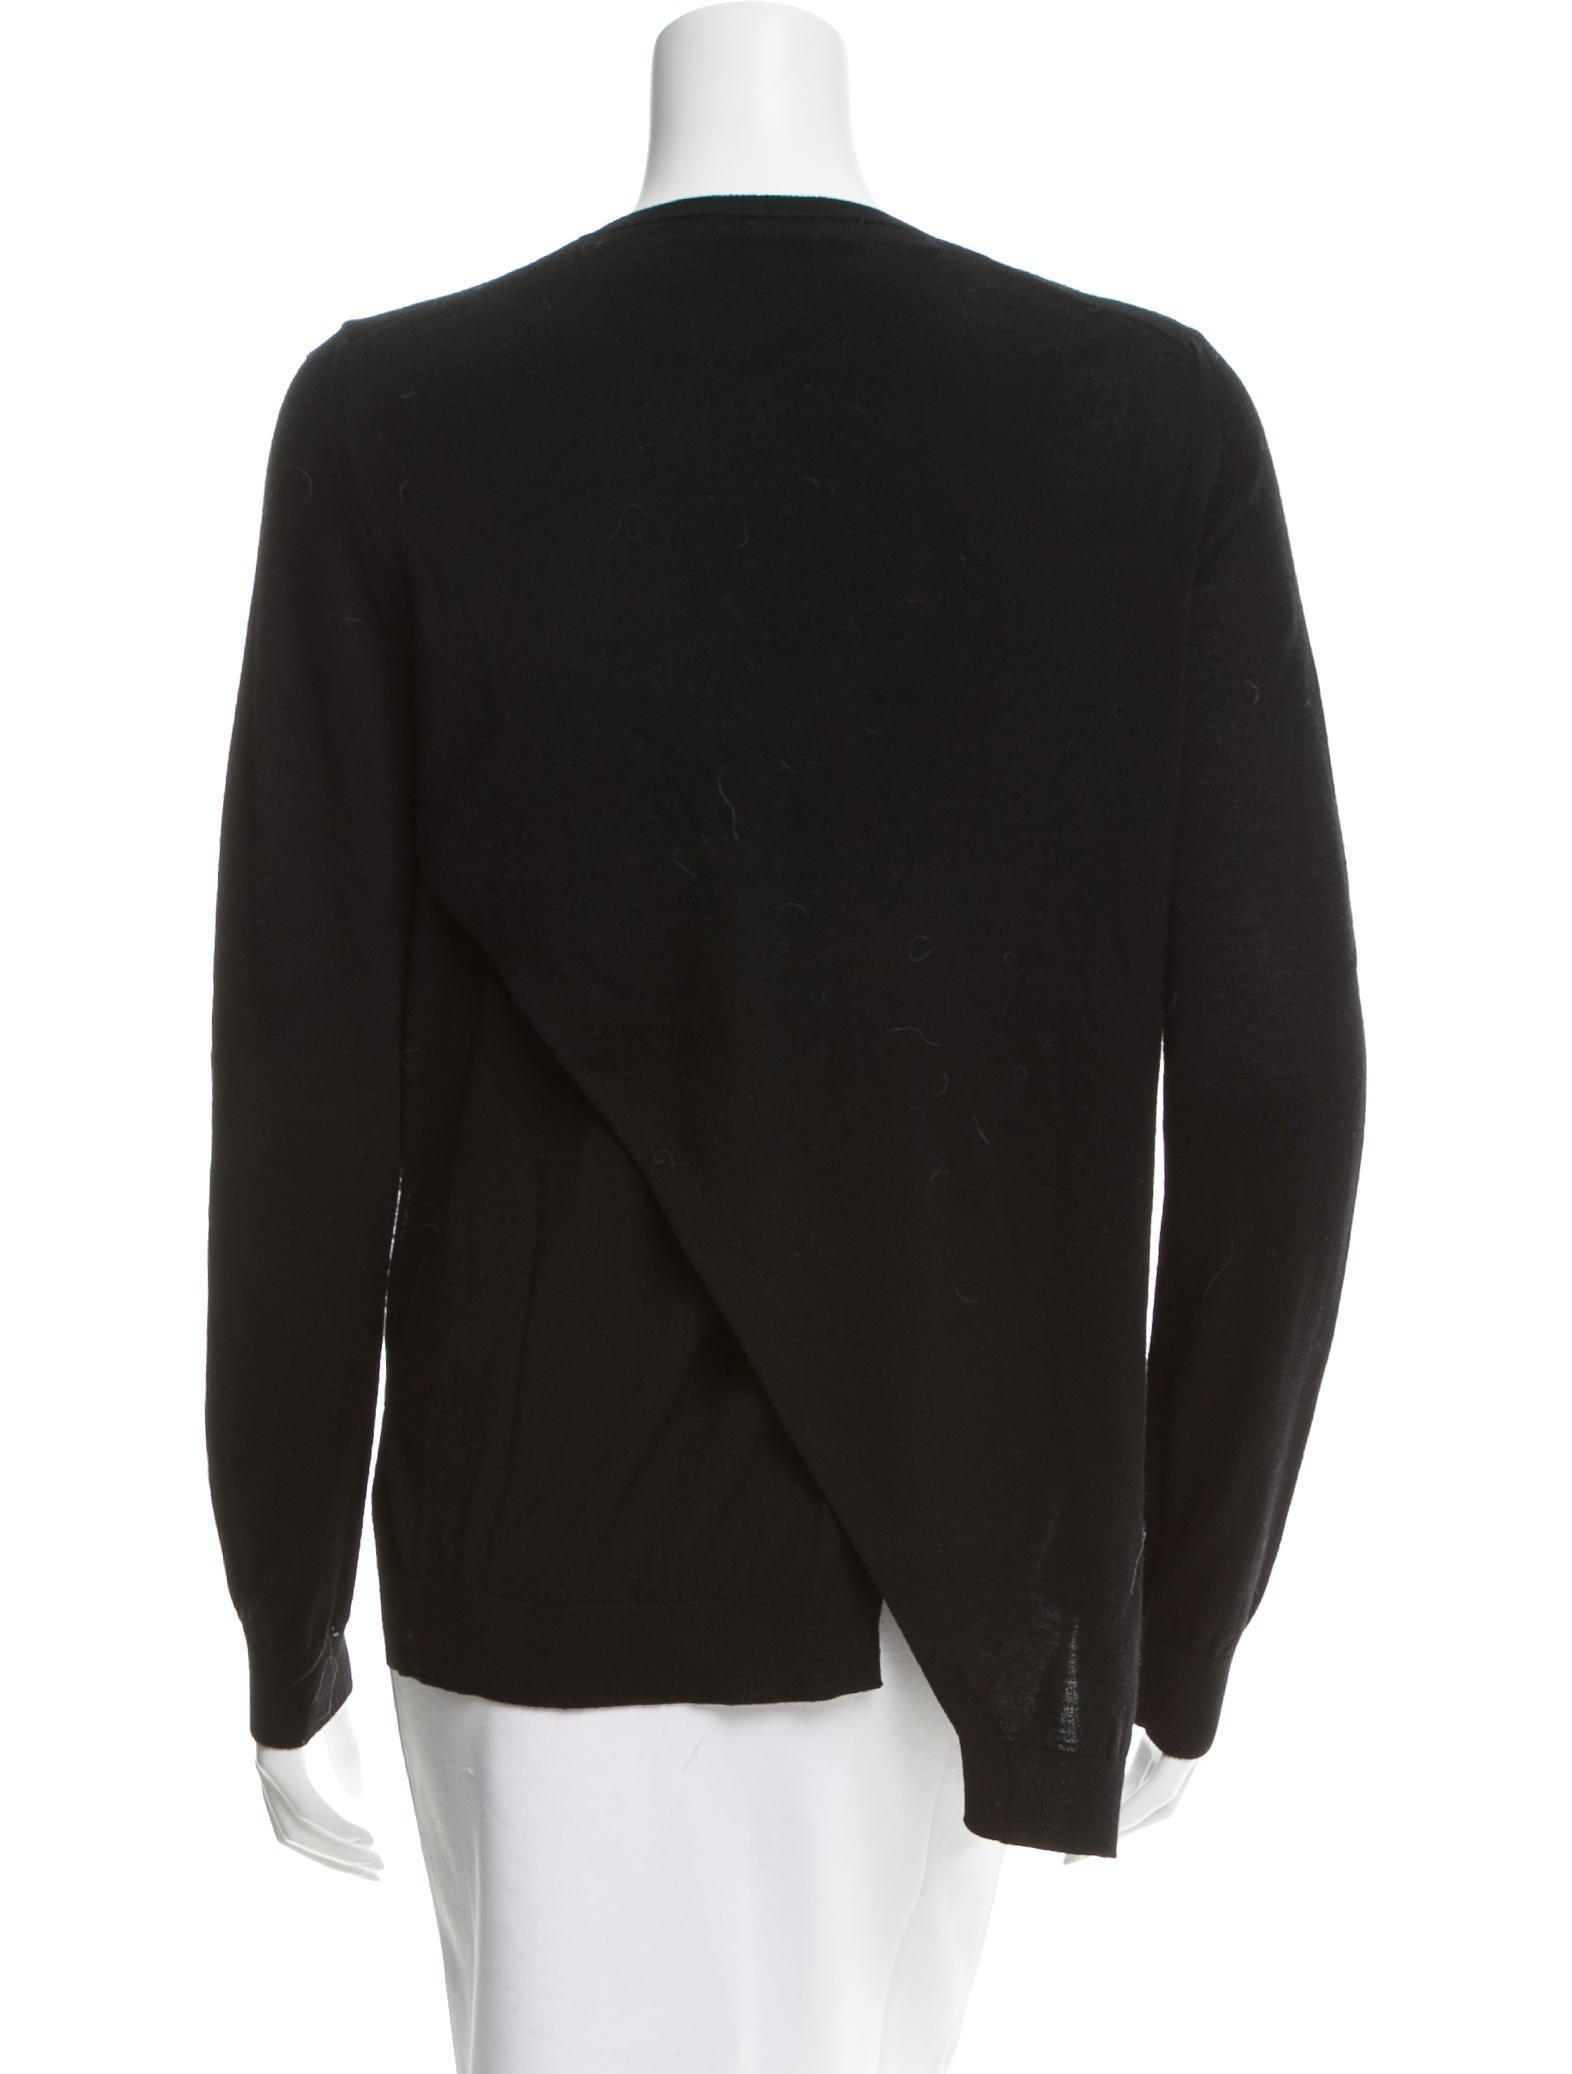 Belstaff wool asymmetrical top clothing bel21551 the for Best wool shirt jackets